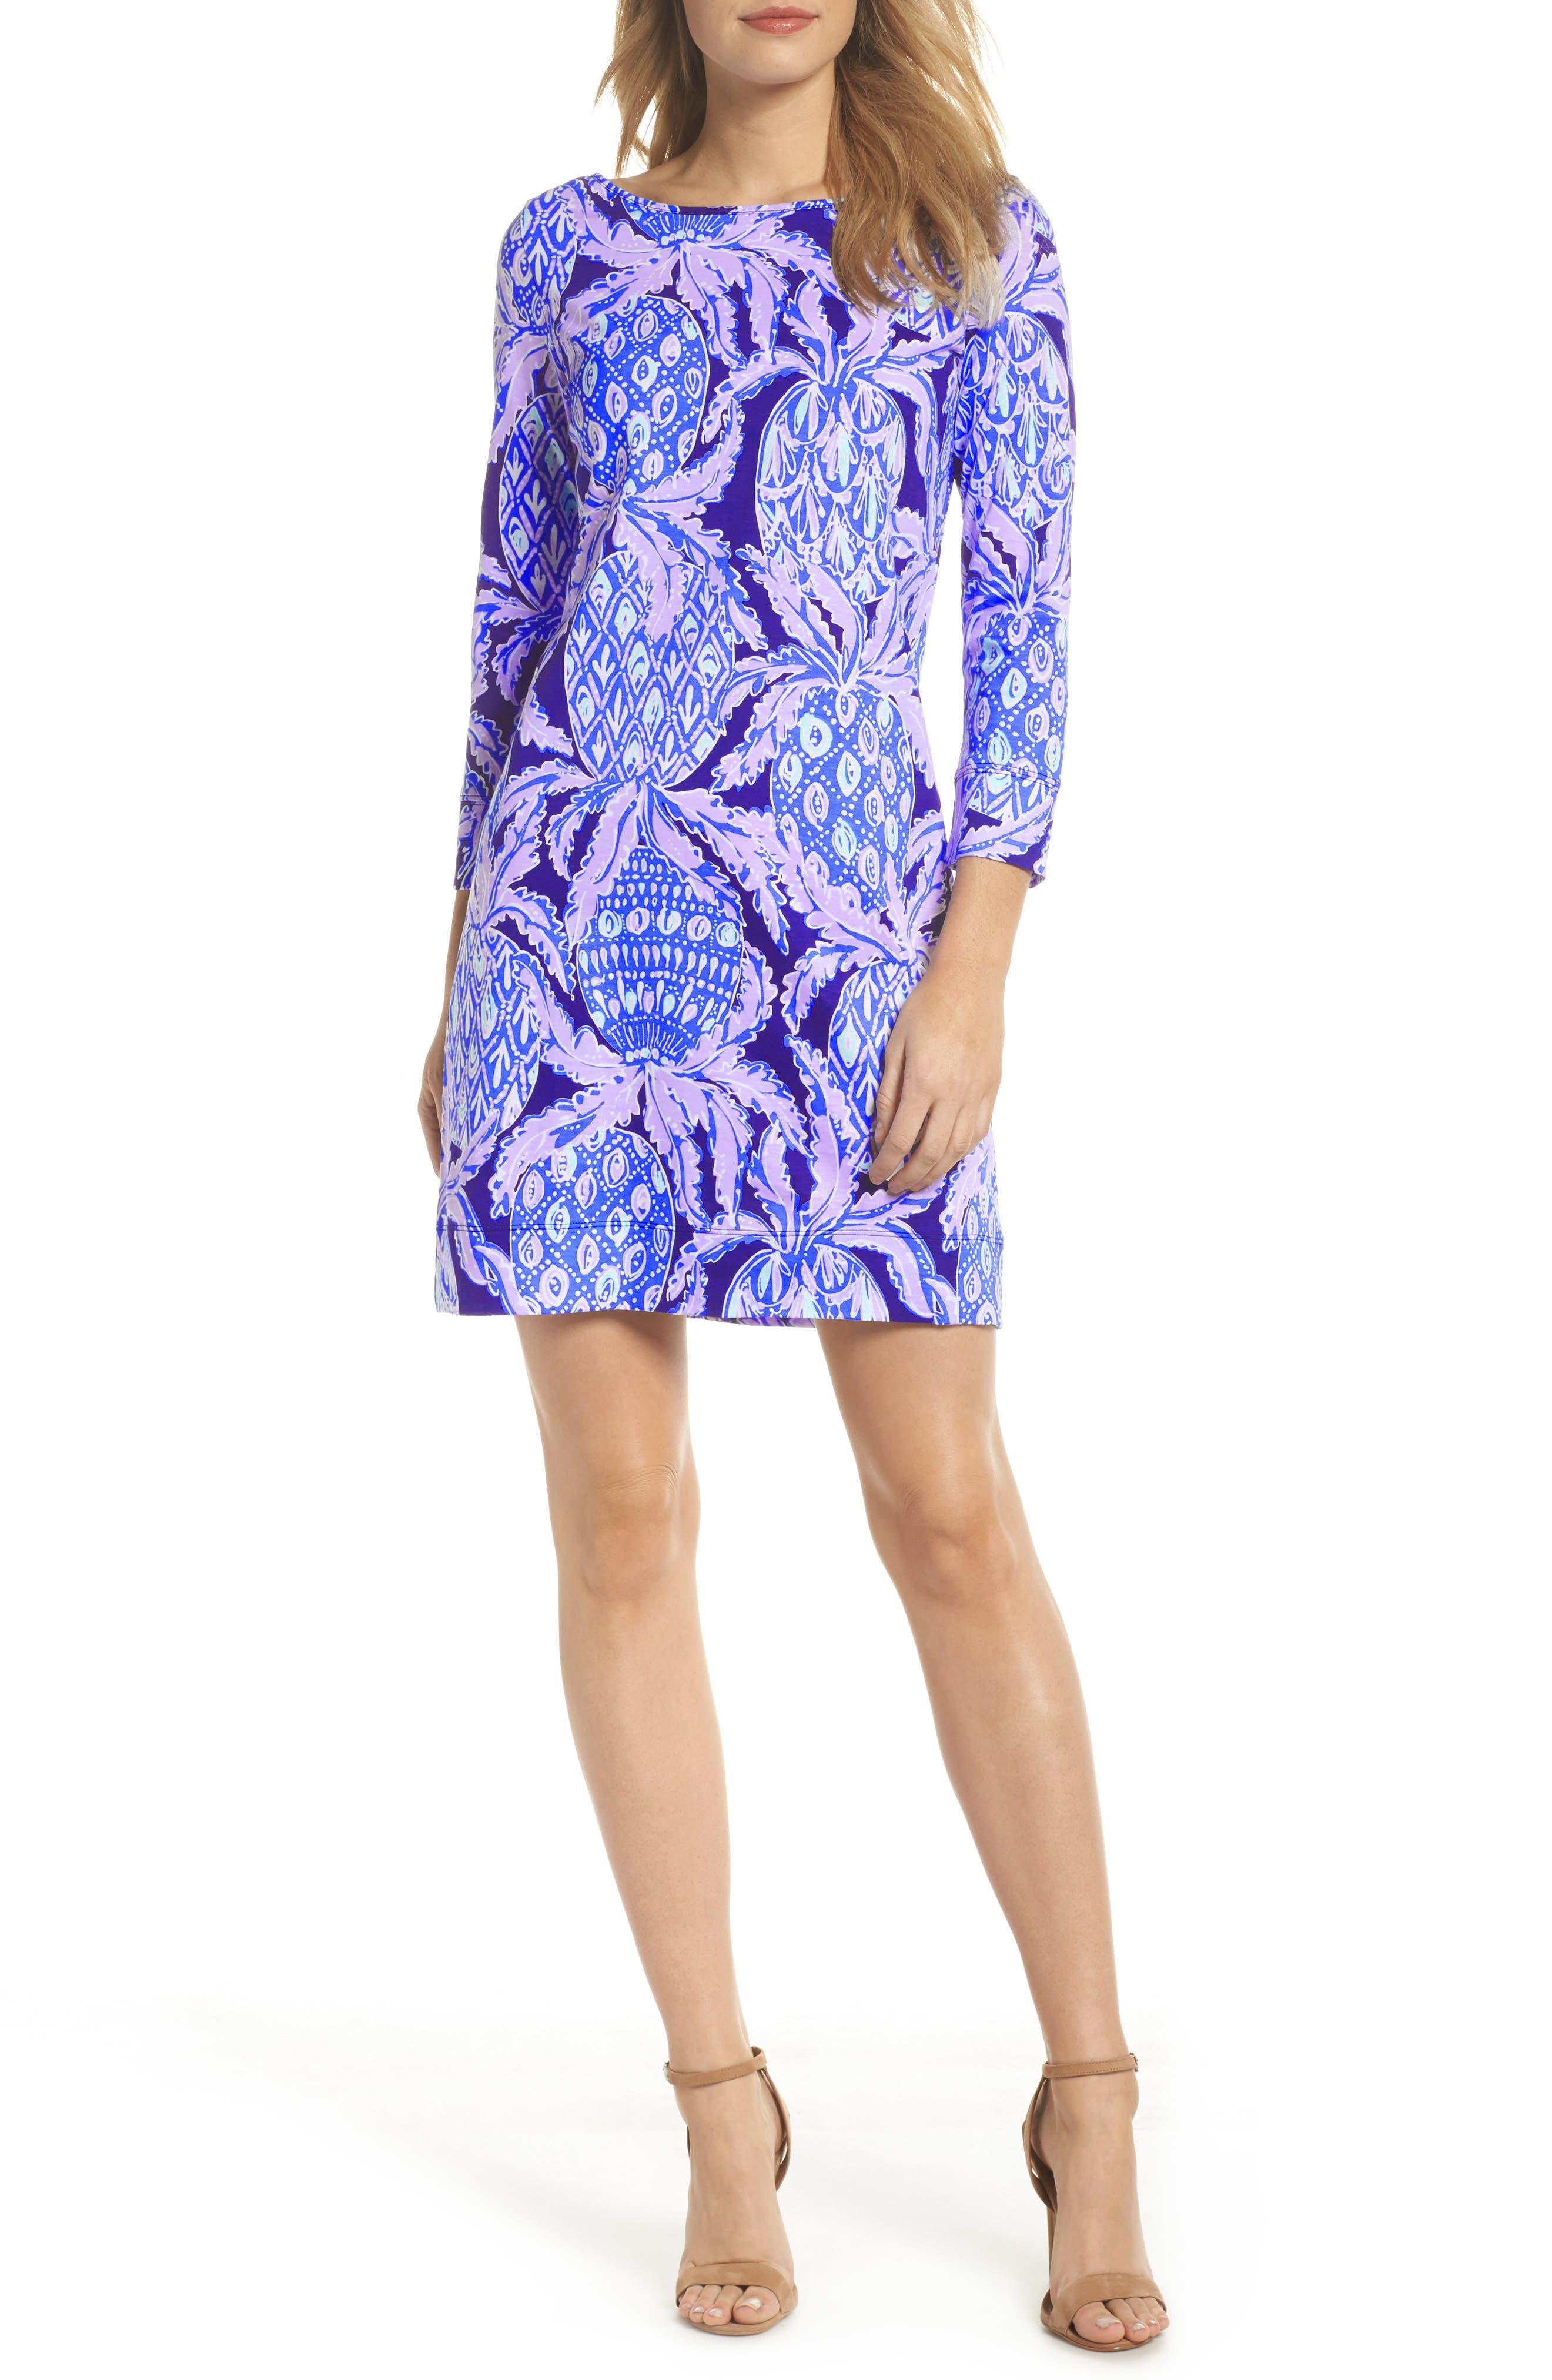 Lilly Pulitzer Womens Girls Fashion